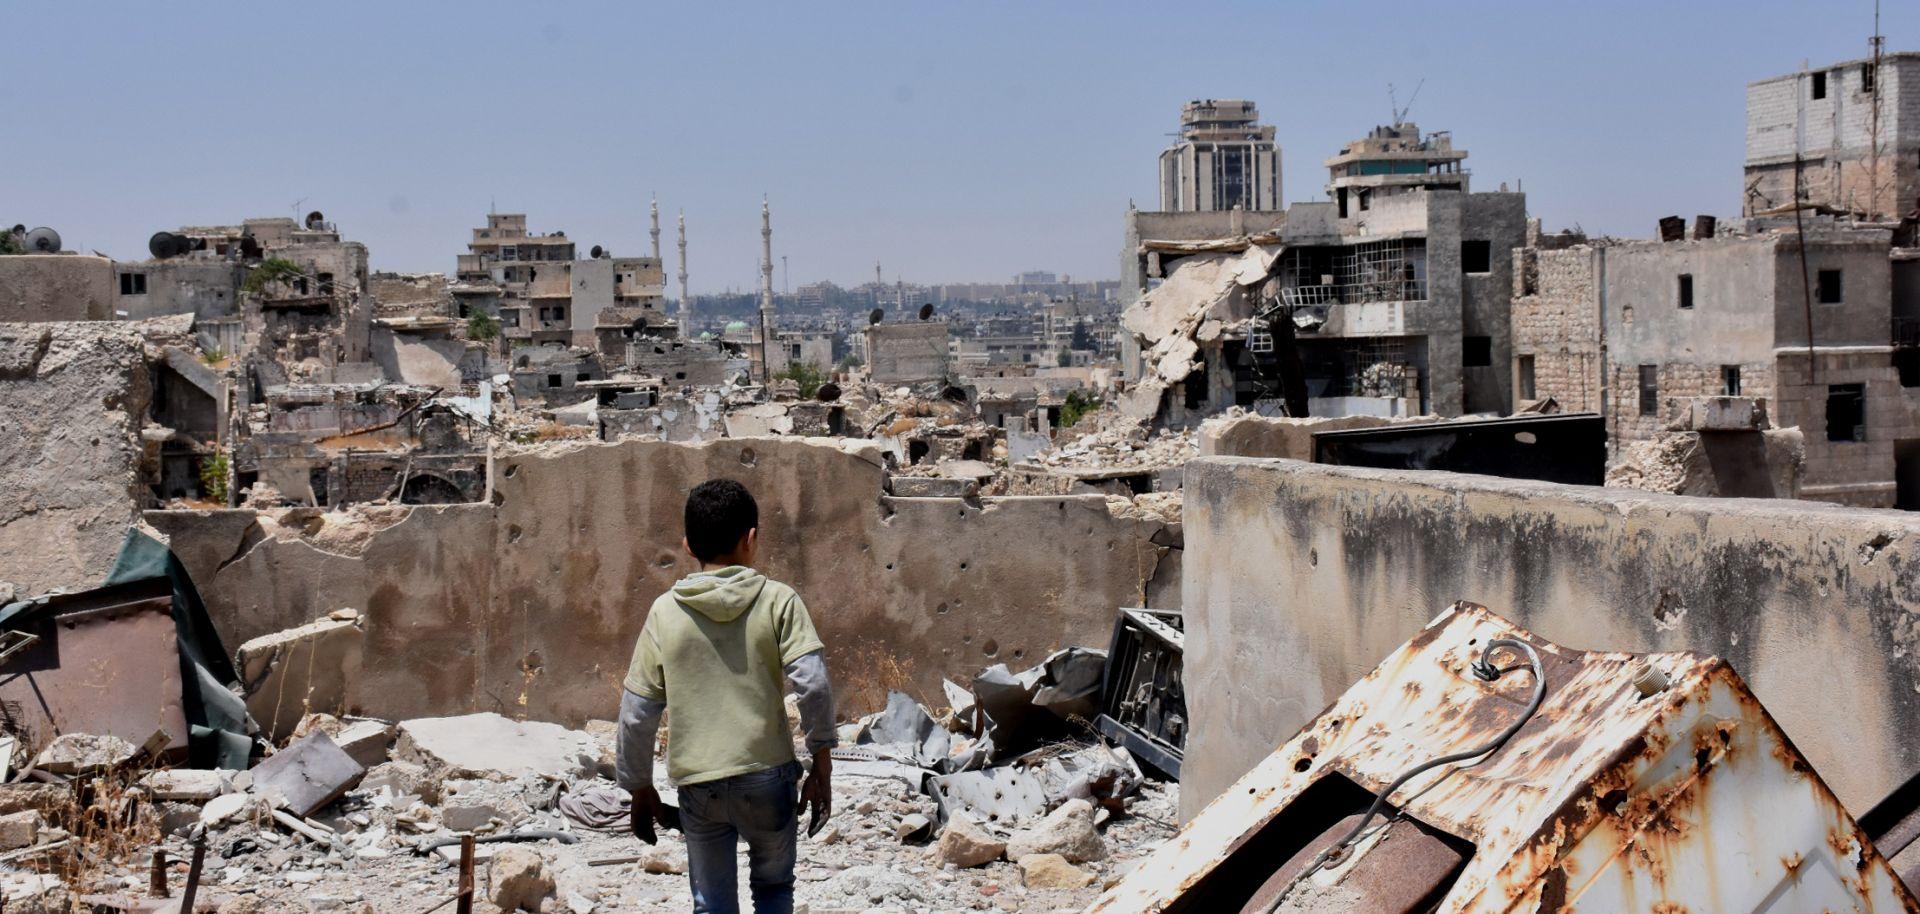 A boy walks amid the rubble in Aleppo, Syria.